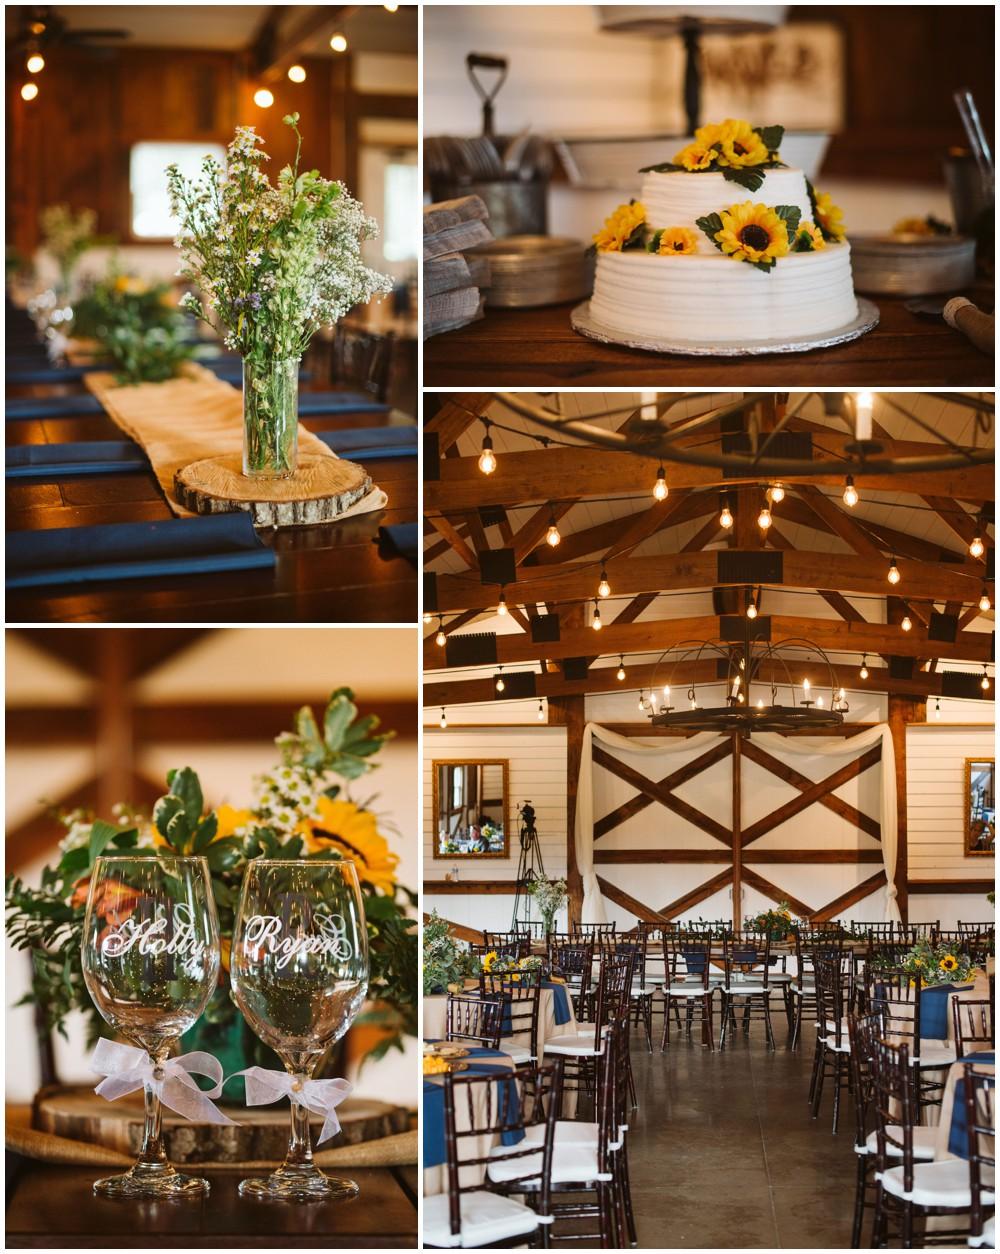 bethany-grace-photo-maryland-wedding-photographer-estate-at-new-kent-winery-virginia_0023.jpg